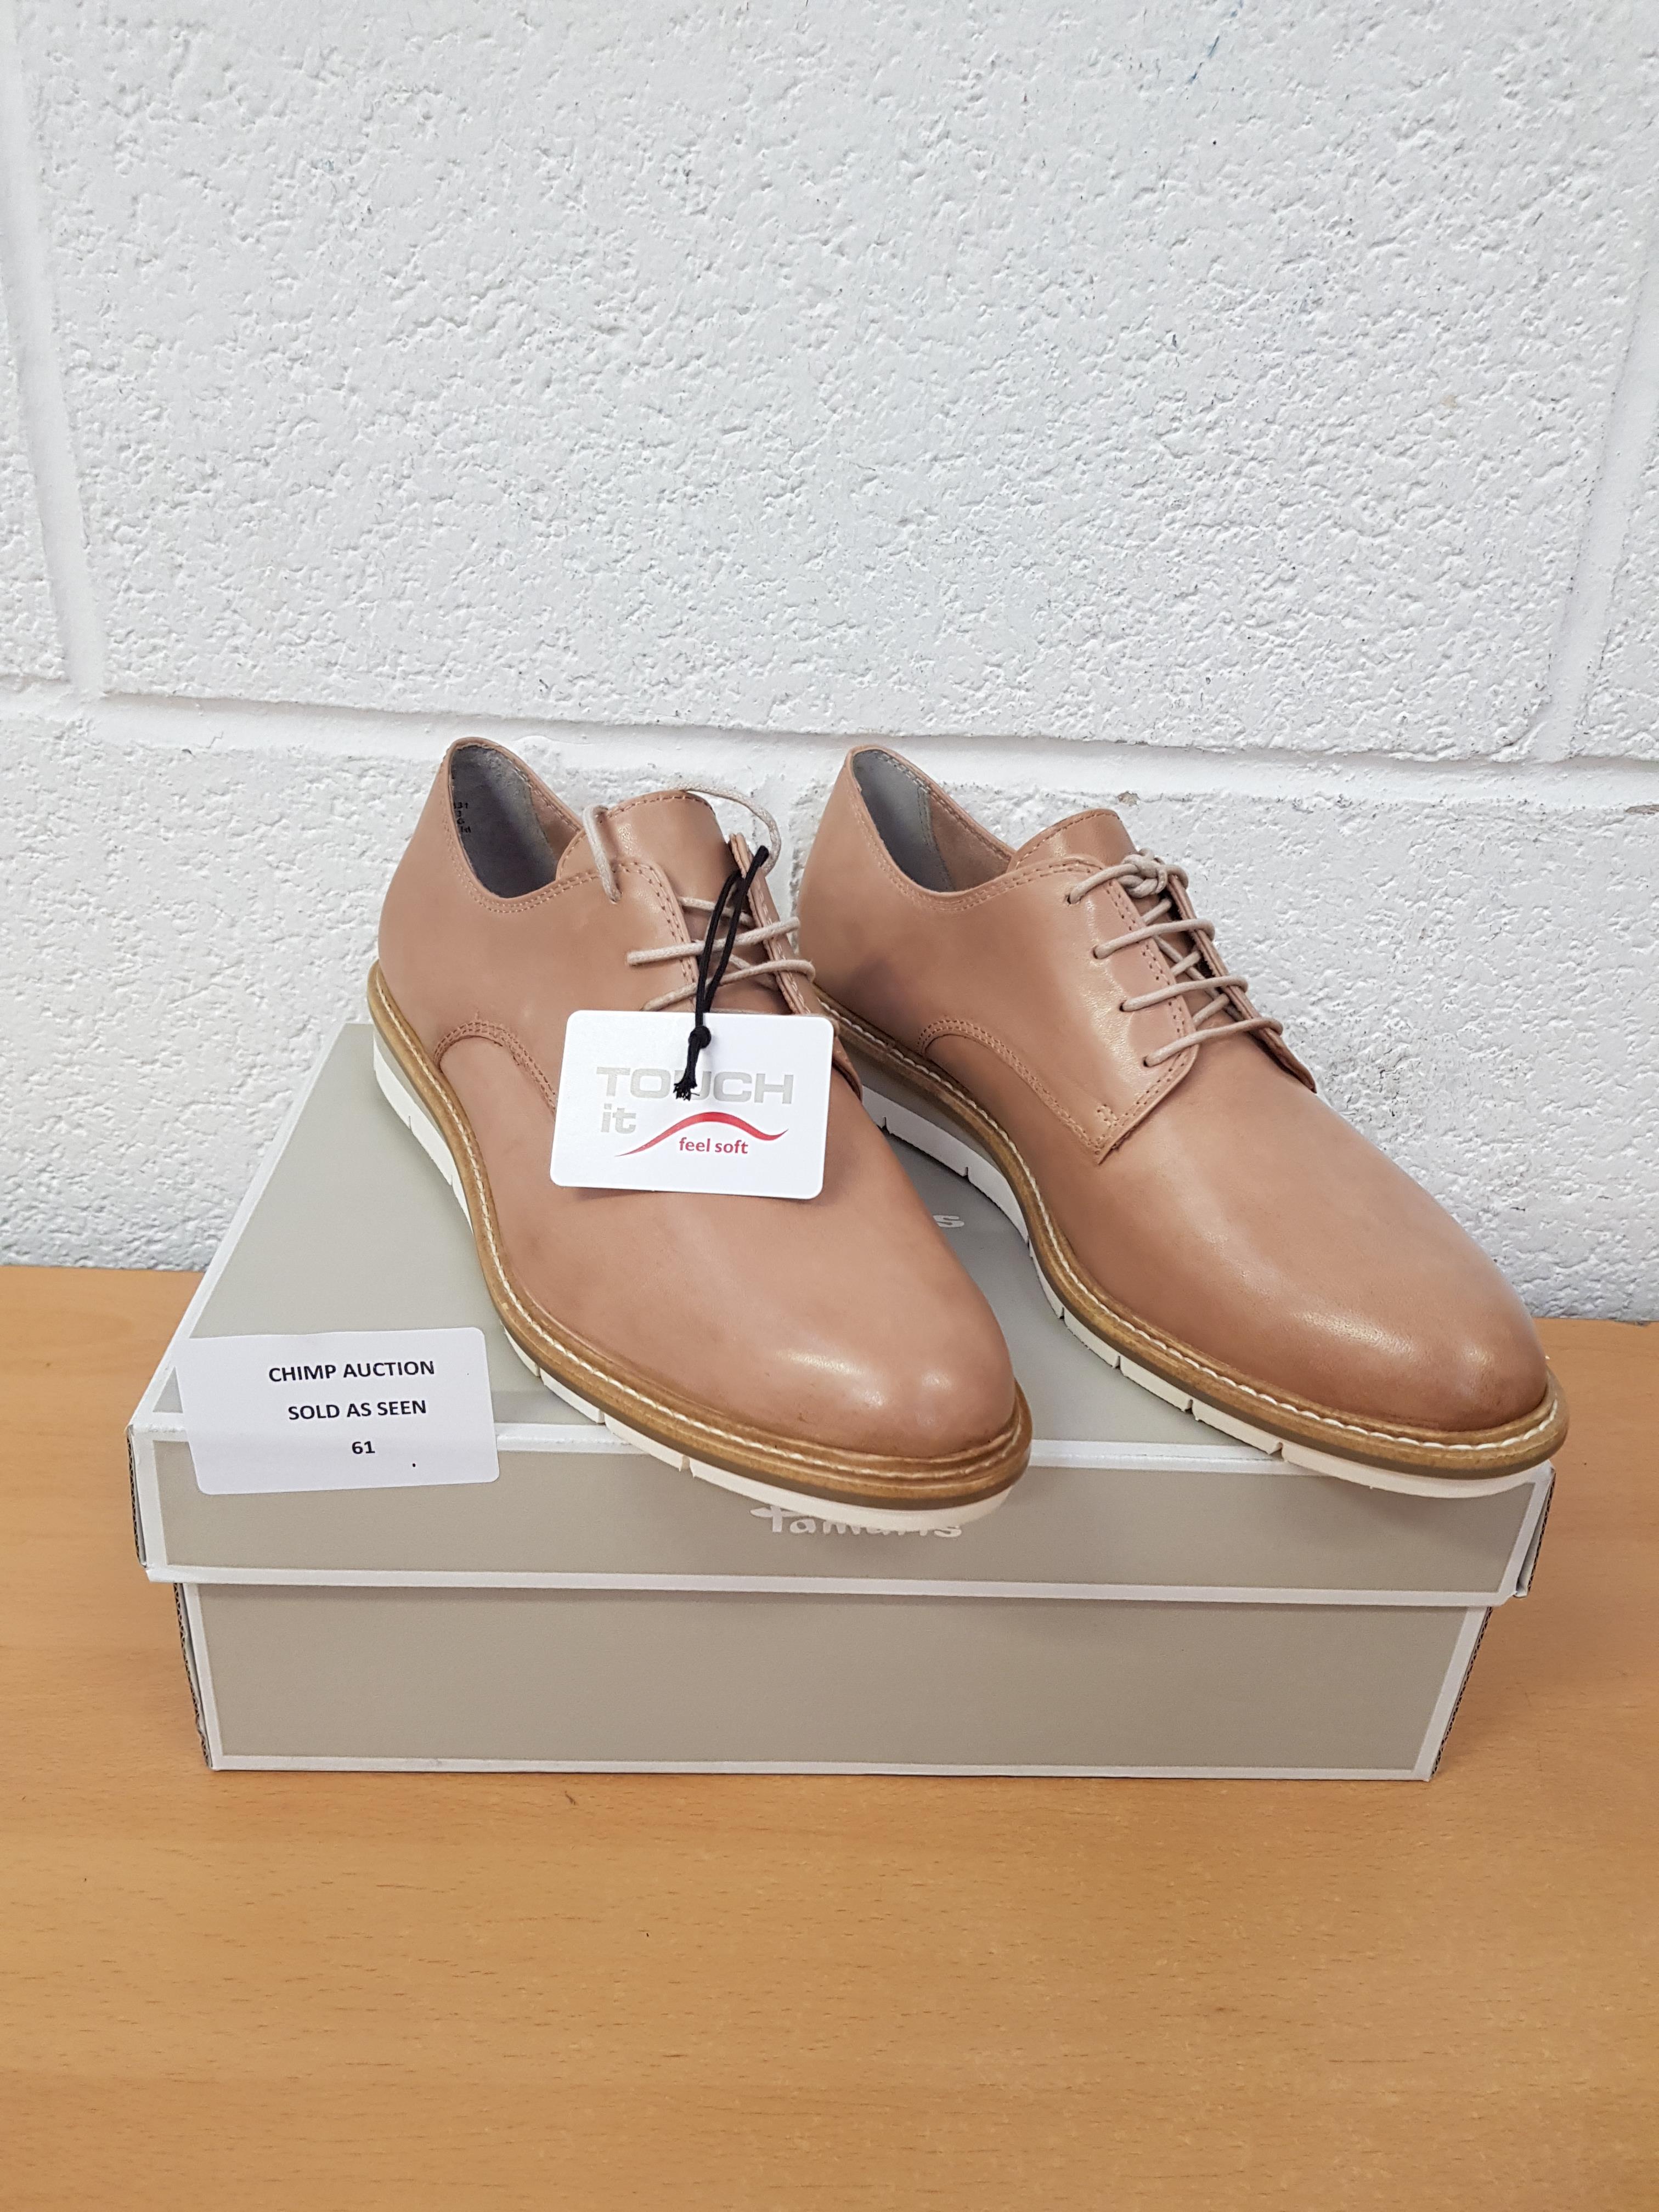 Lot 61 - Tamaris ladies shoes EU 39